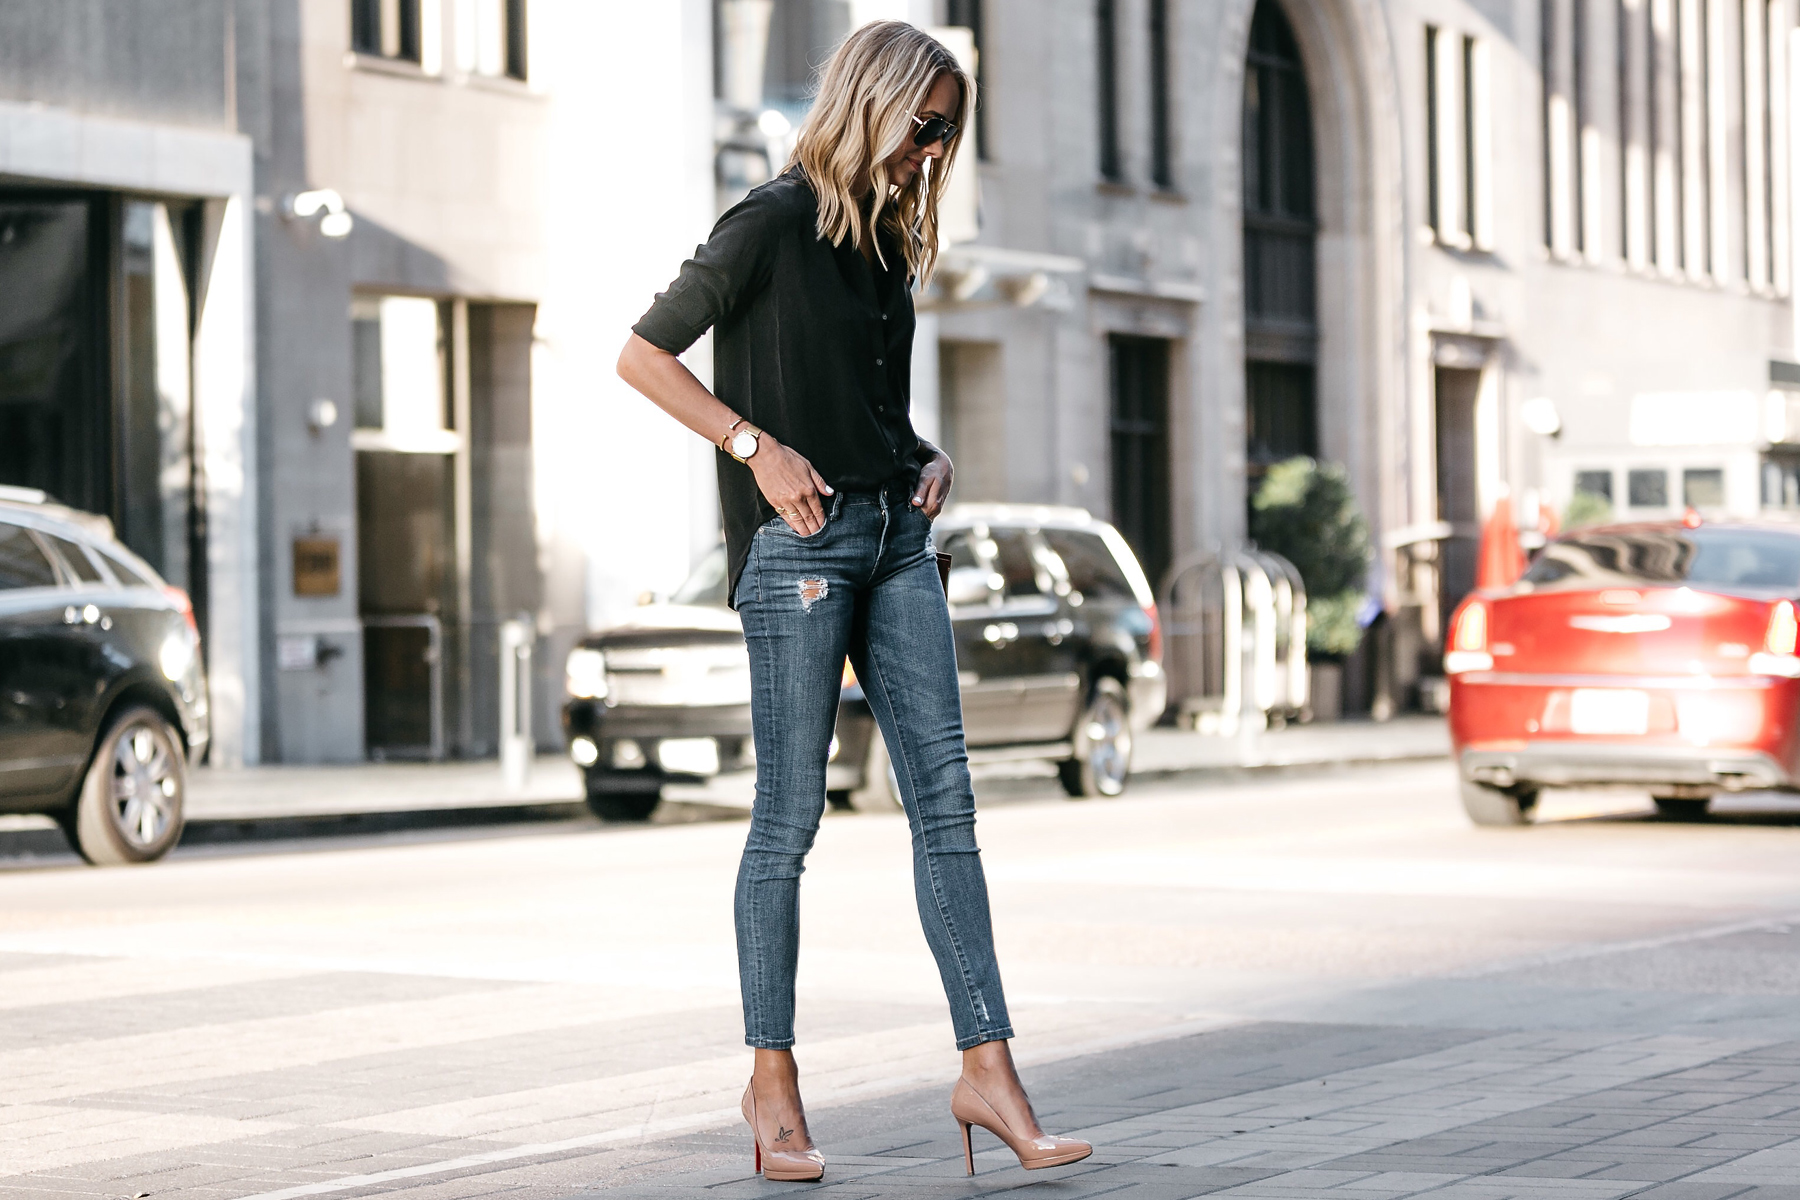 Blonde Wearing Everlane Black Button Up Shirt Denim Skinny Jeans Outfit Christian Louboutin Nude Pumps Fashion Jackson Dallas Blogger Fashion Blogger Street Style